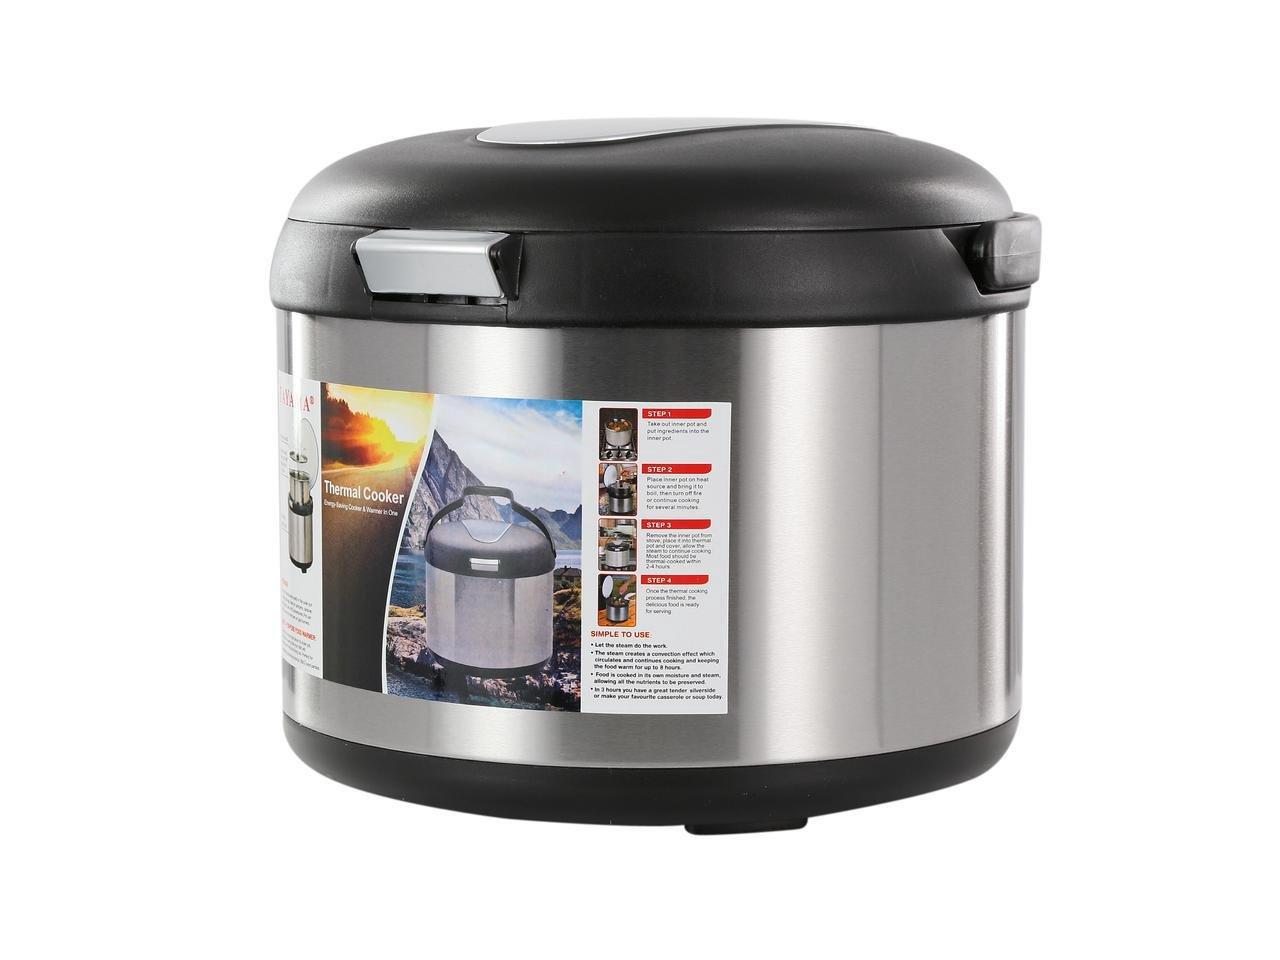 Tayama TXM-50CF Energy-Saving Thermal Cooker, 5 L, Black by TAYAMA